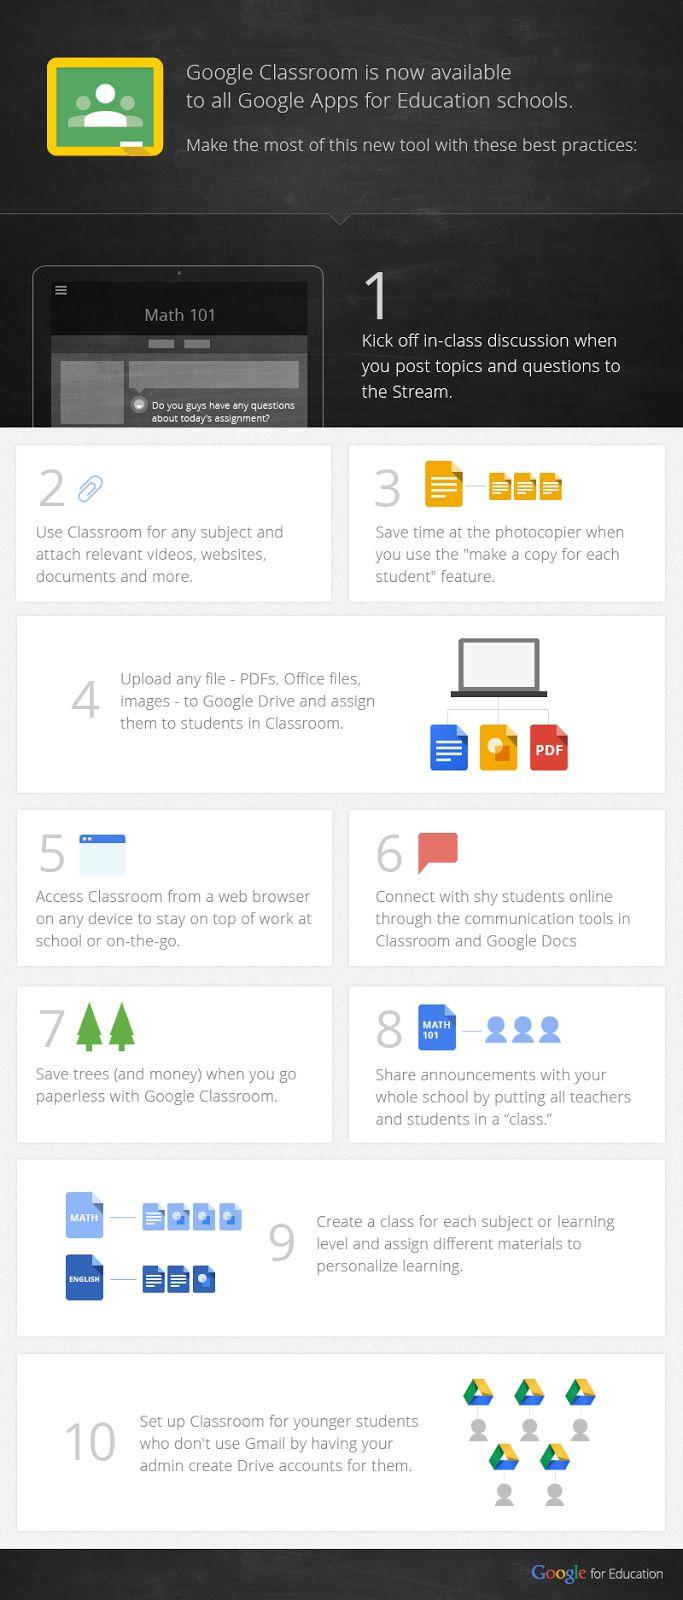 10 buenas prácticas con Google Classroom